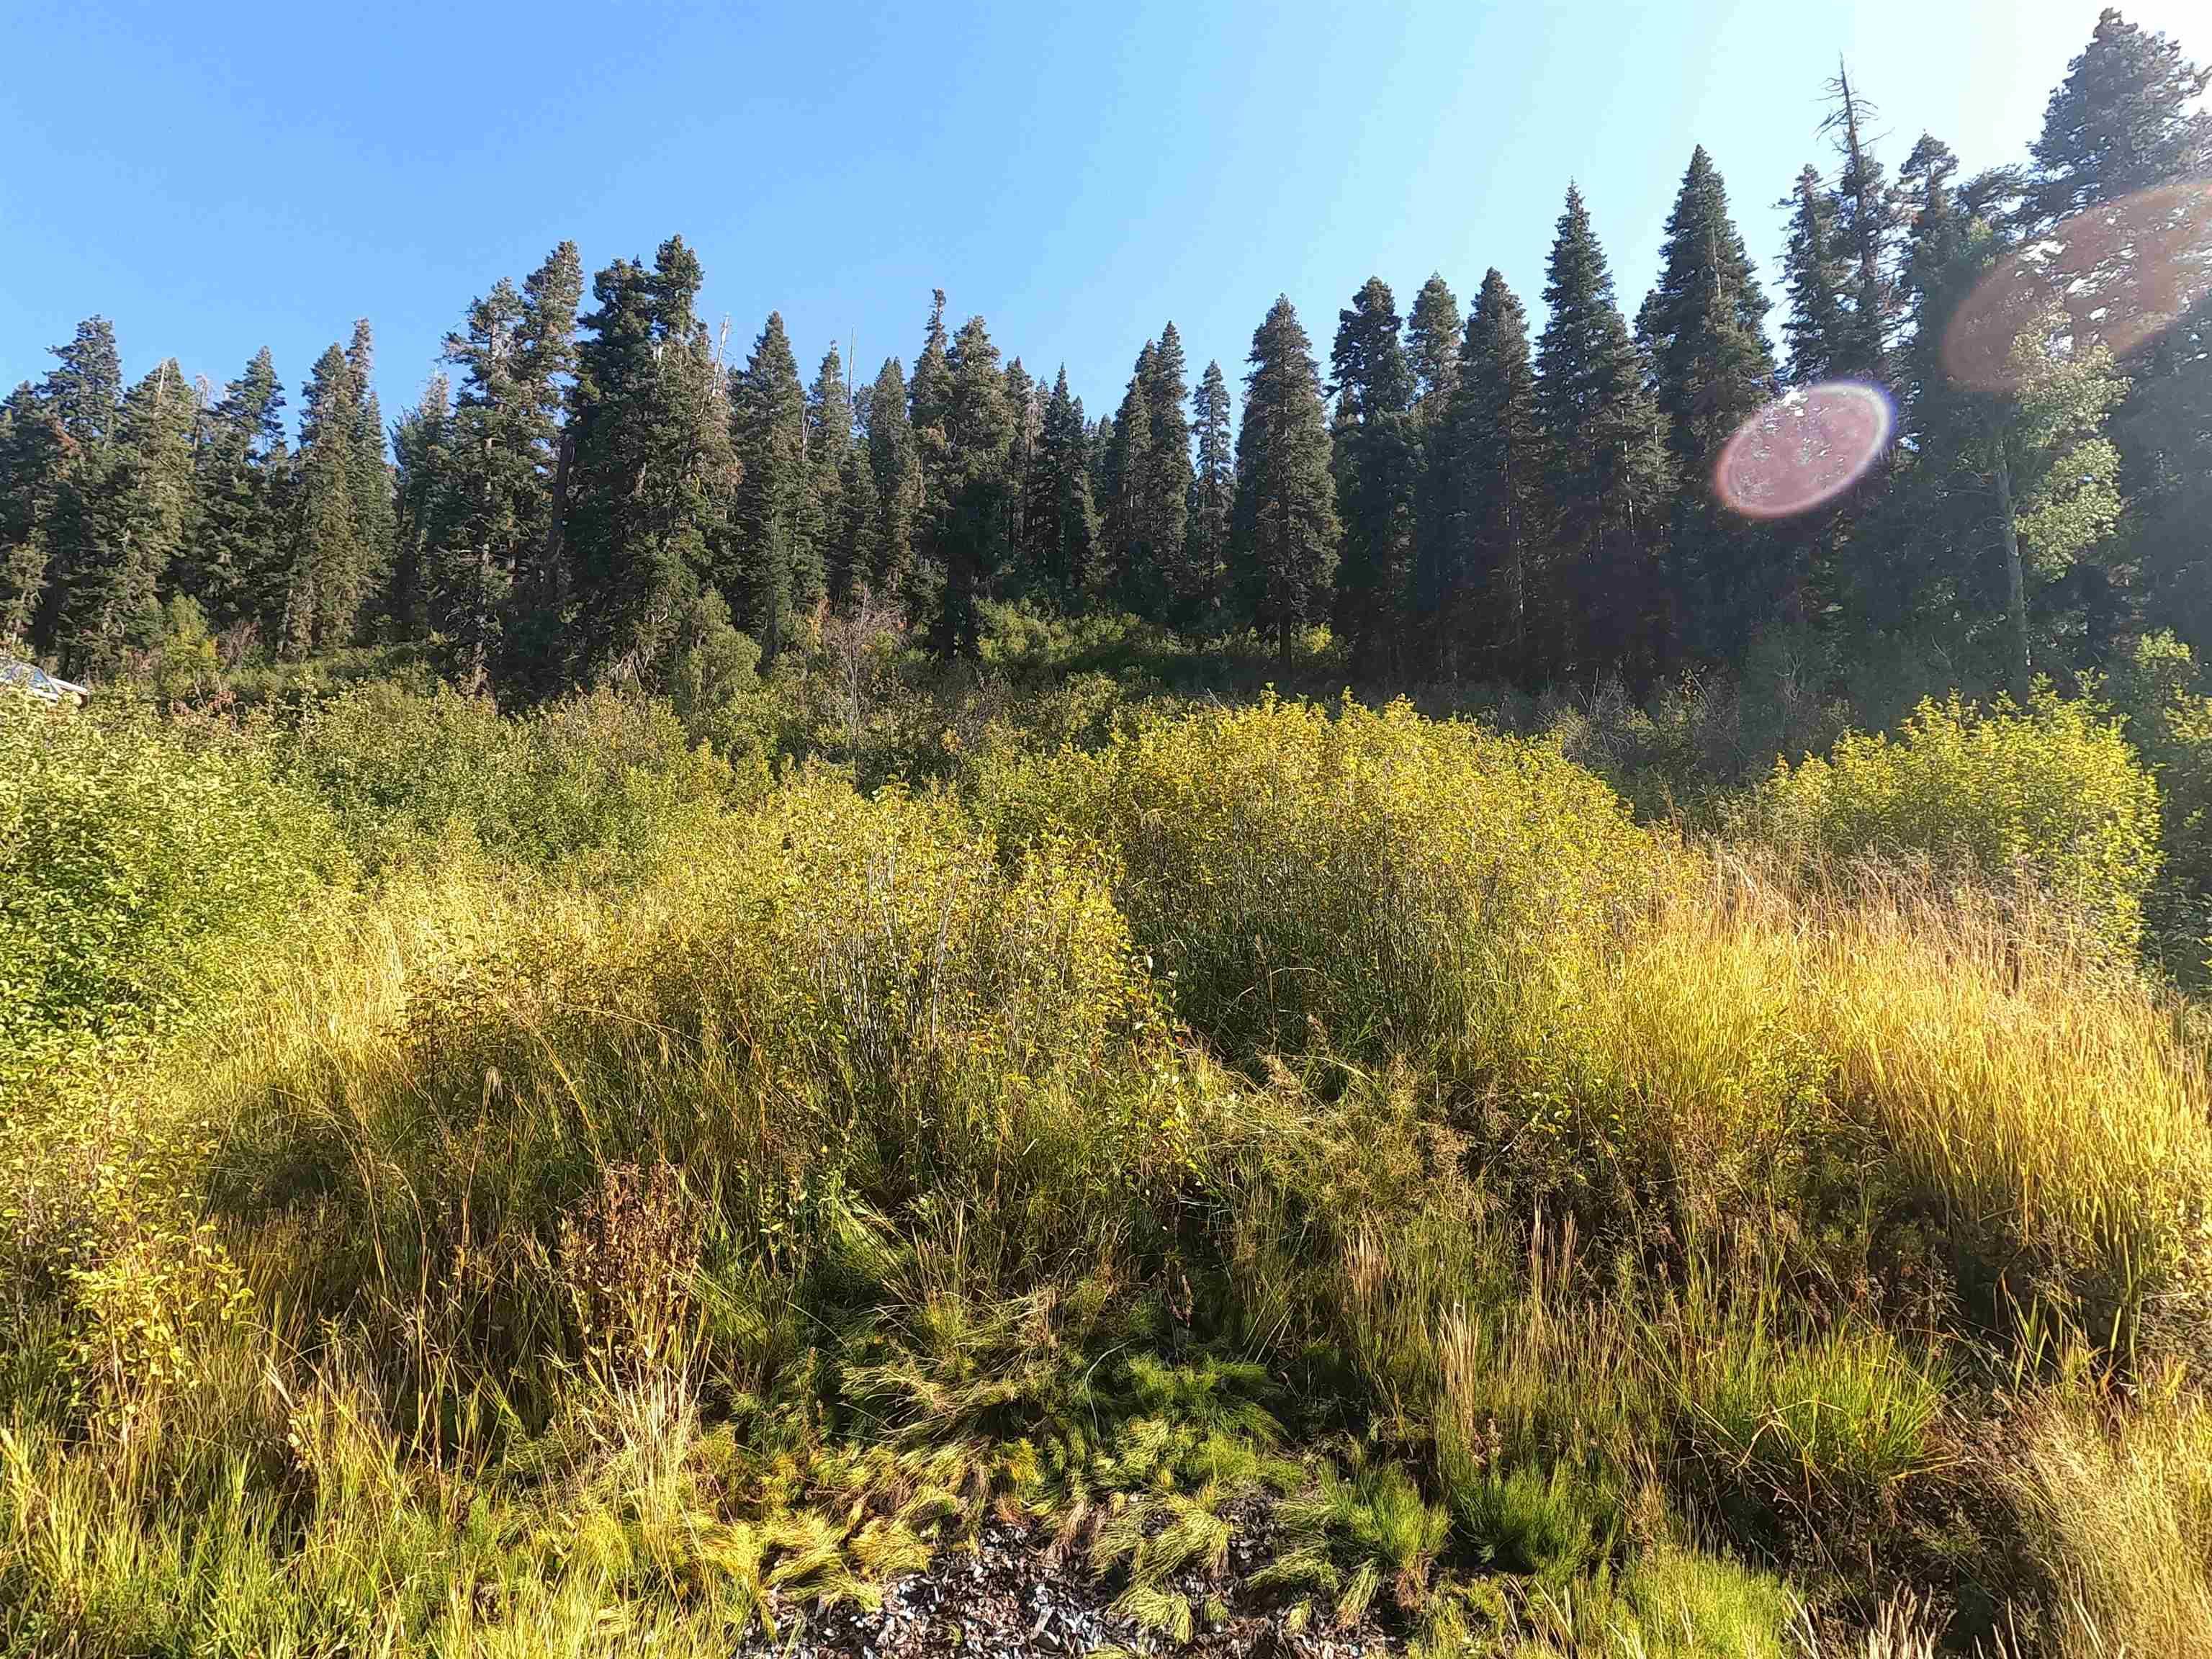 Image for 1051 Snow Crest Road, Alpine Meadows, CA 96146-9745